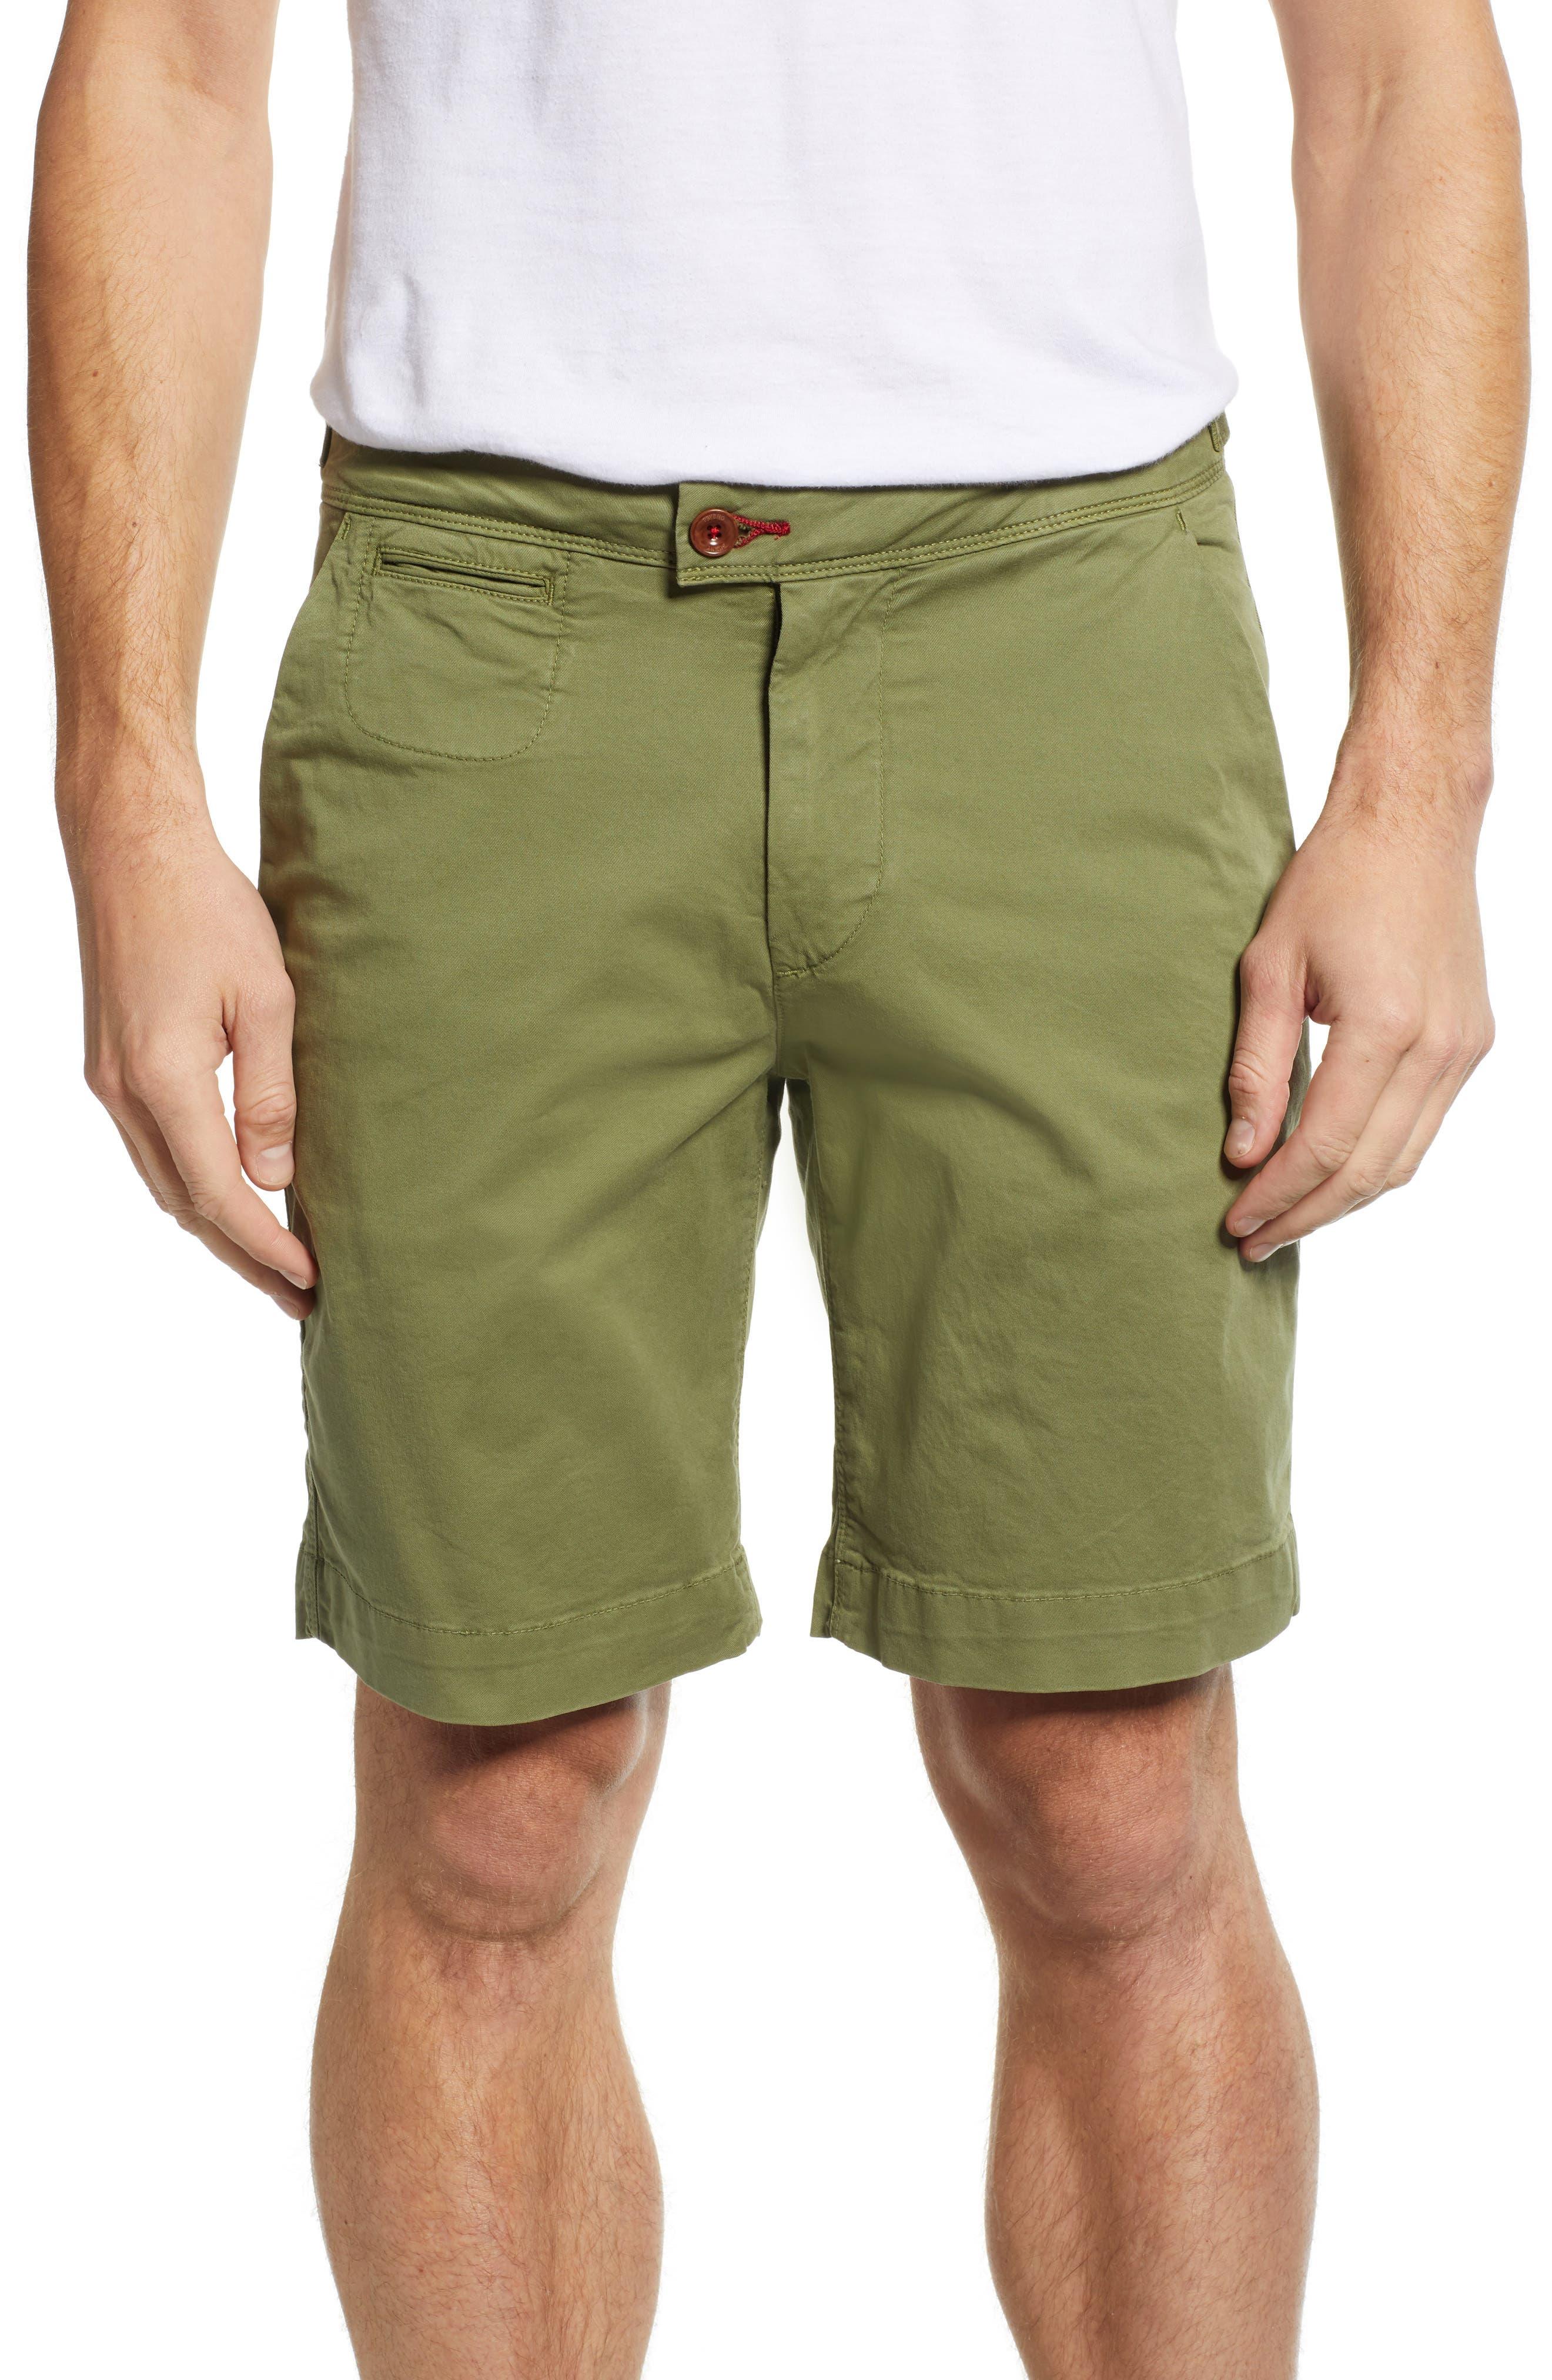 Triumph Shorts,                         Main,                         color, OLIVINE